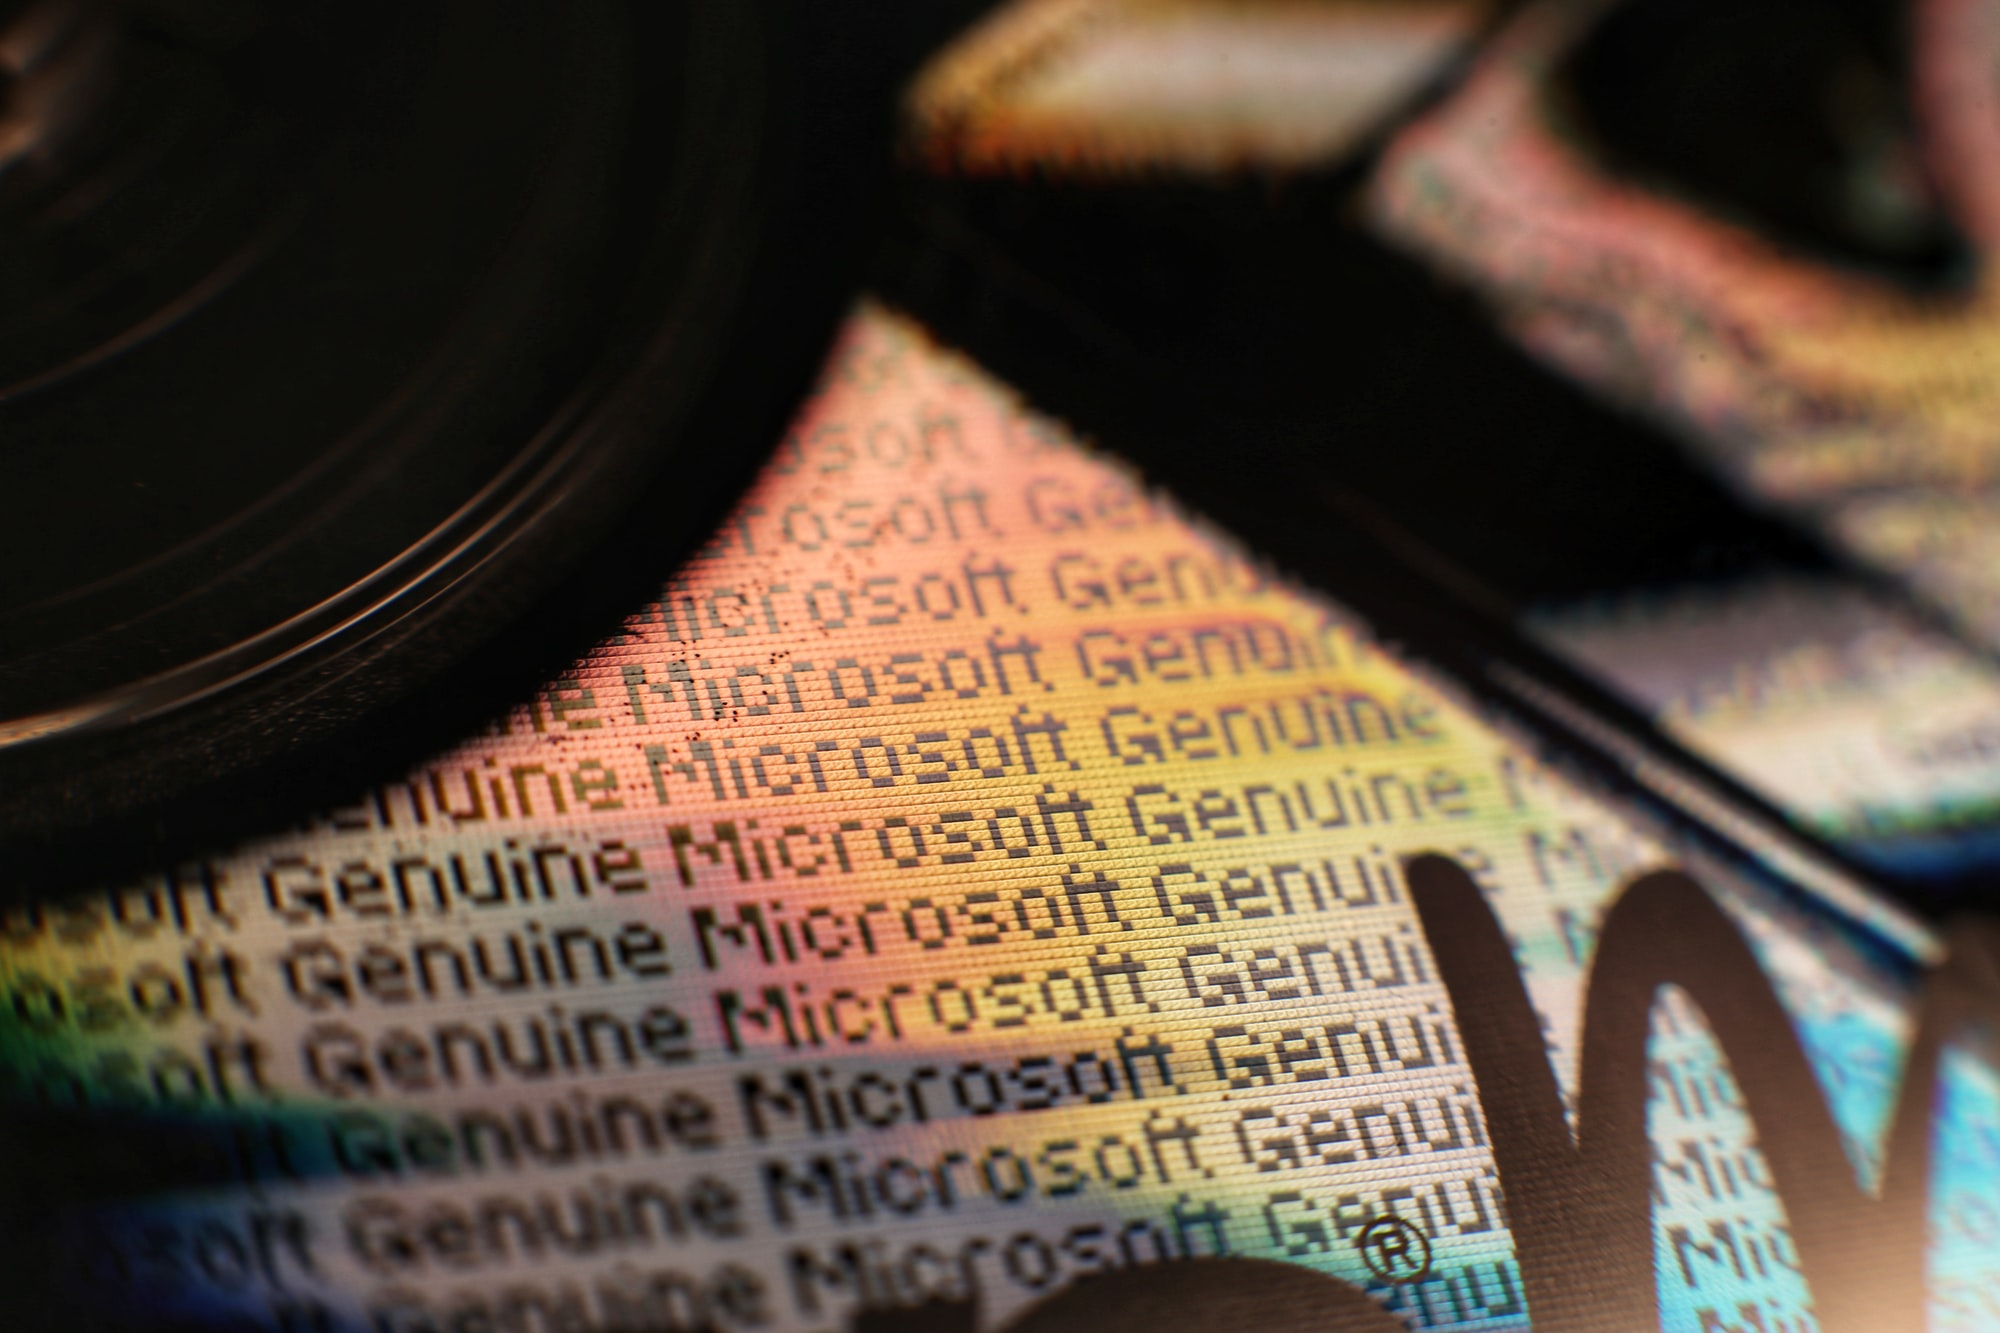 Microsoft Measured Boot Process, Attestation Servers, etc.